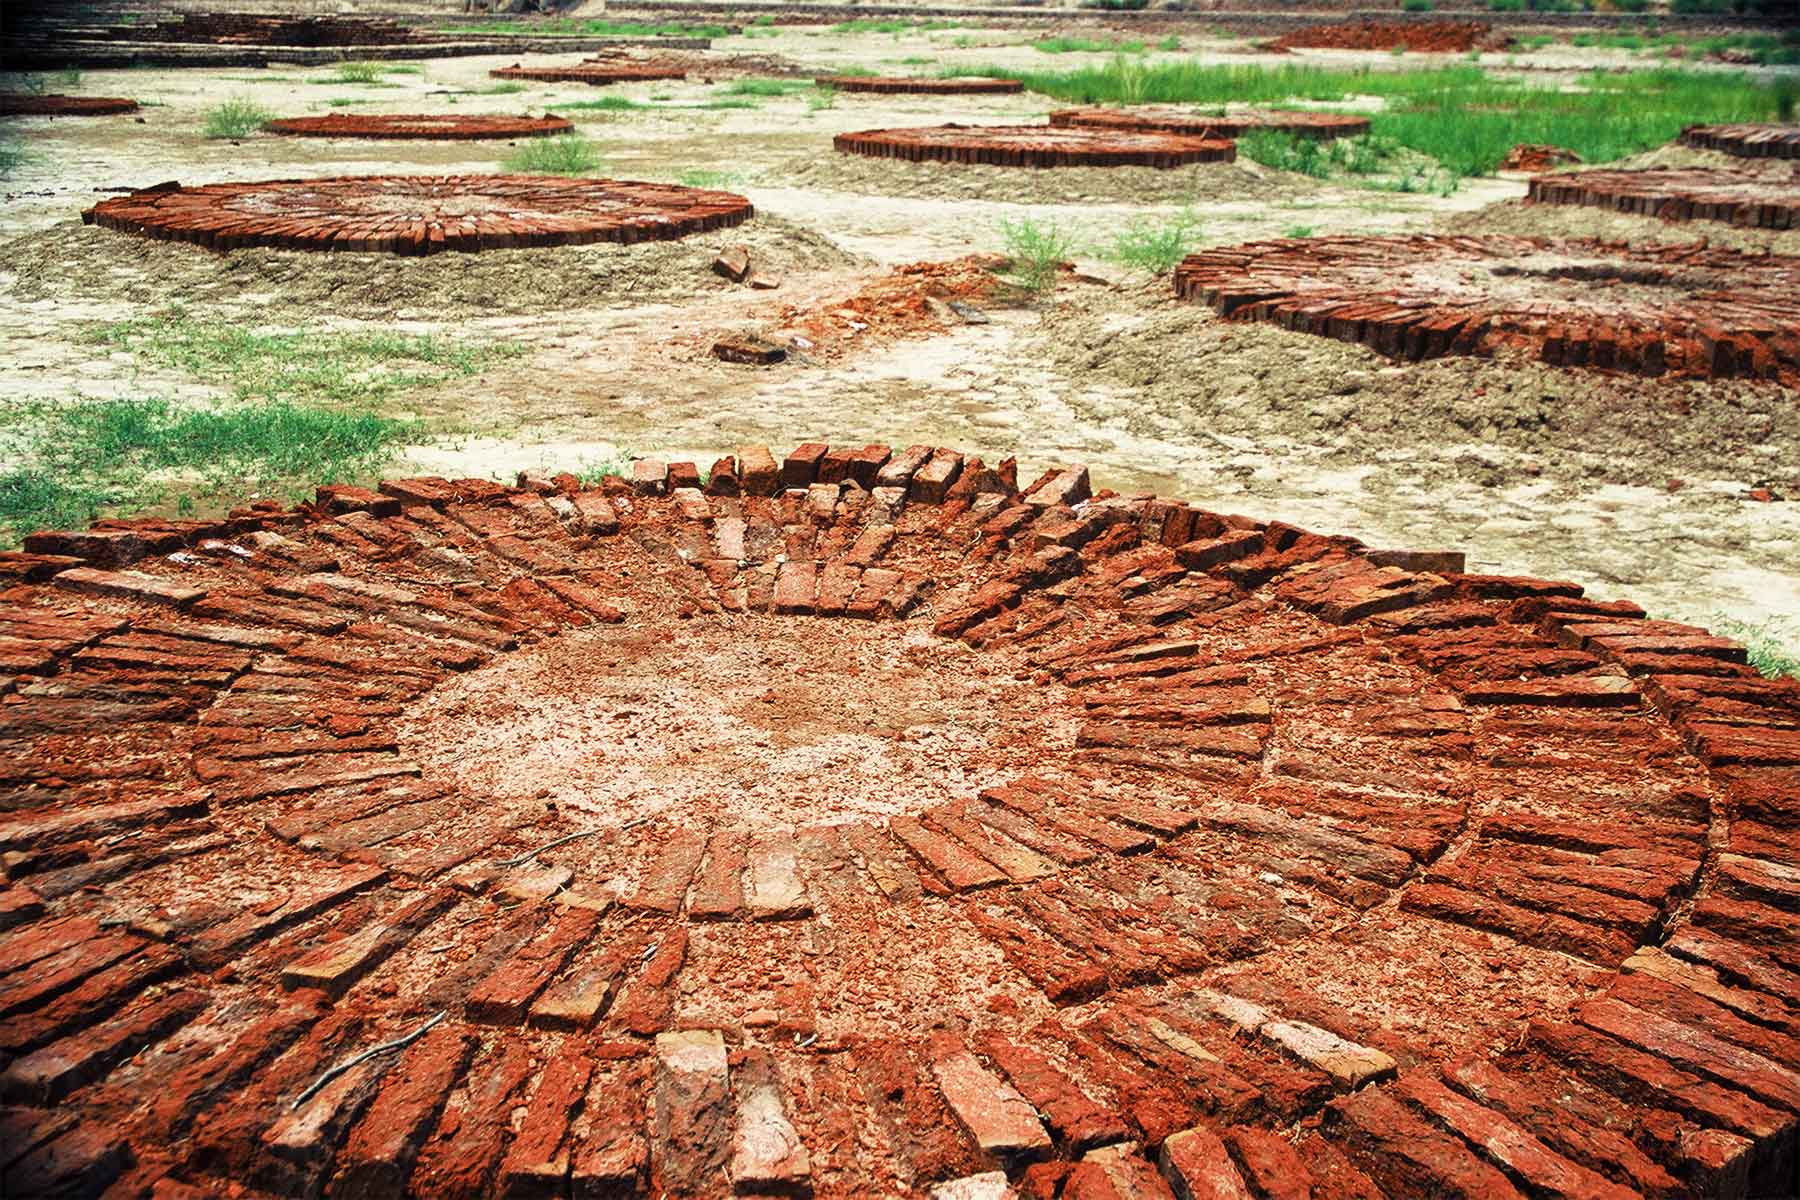 Harappa - Indus River Valley Civilization - Steven Andrew Martin - Pakistan Photo Journal